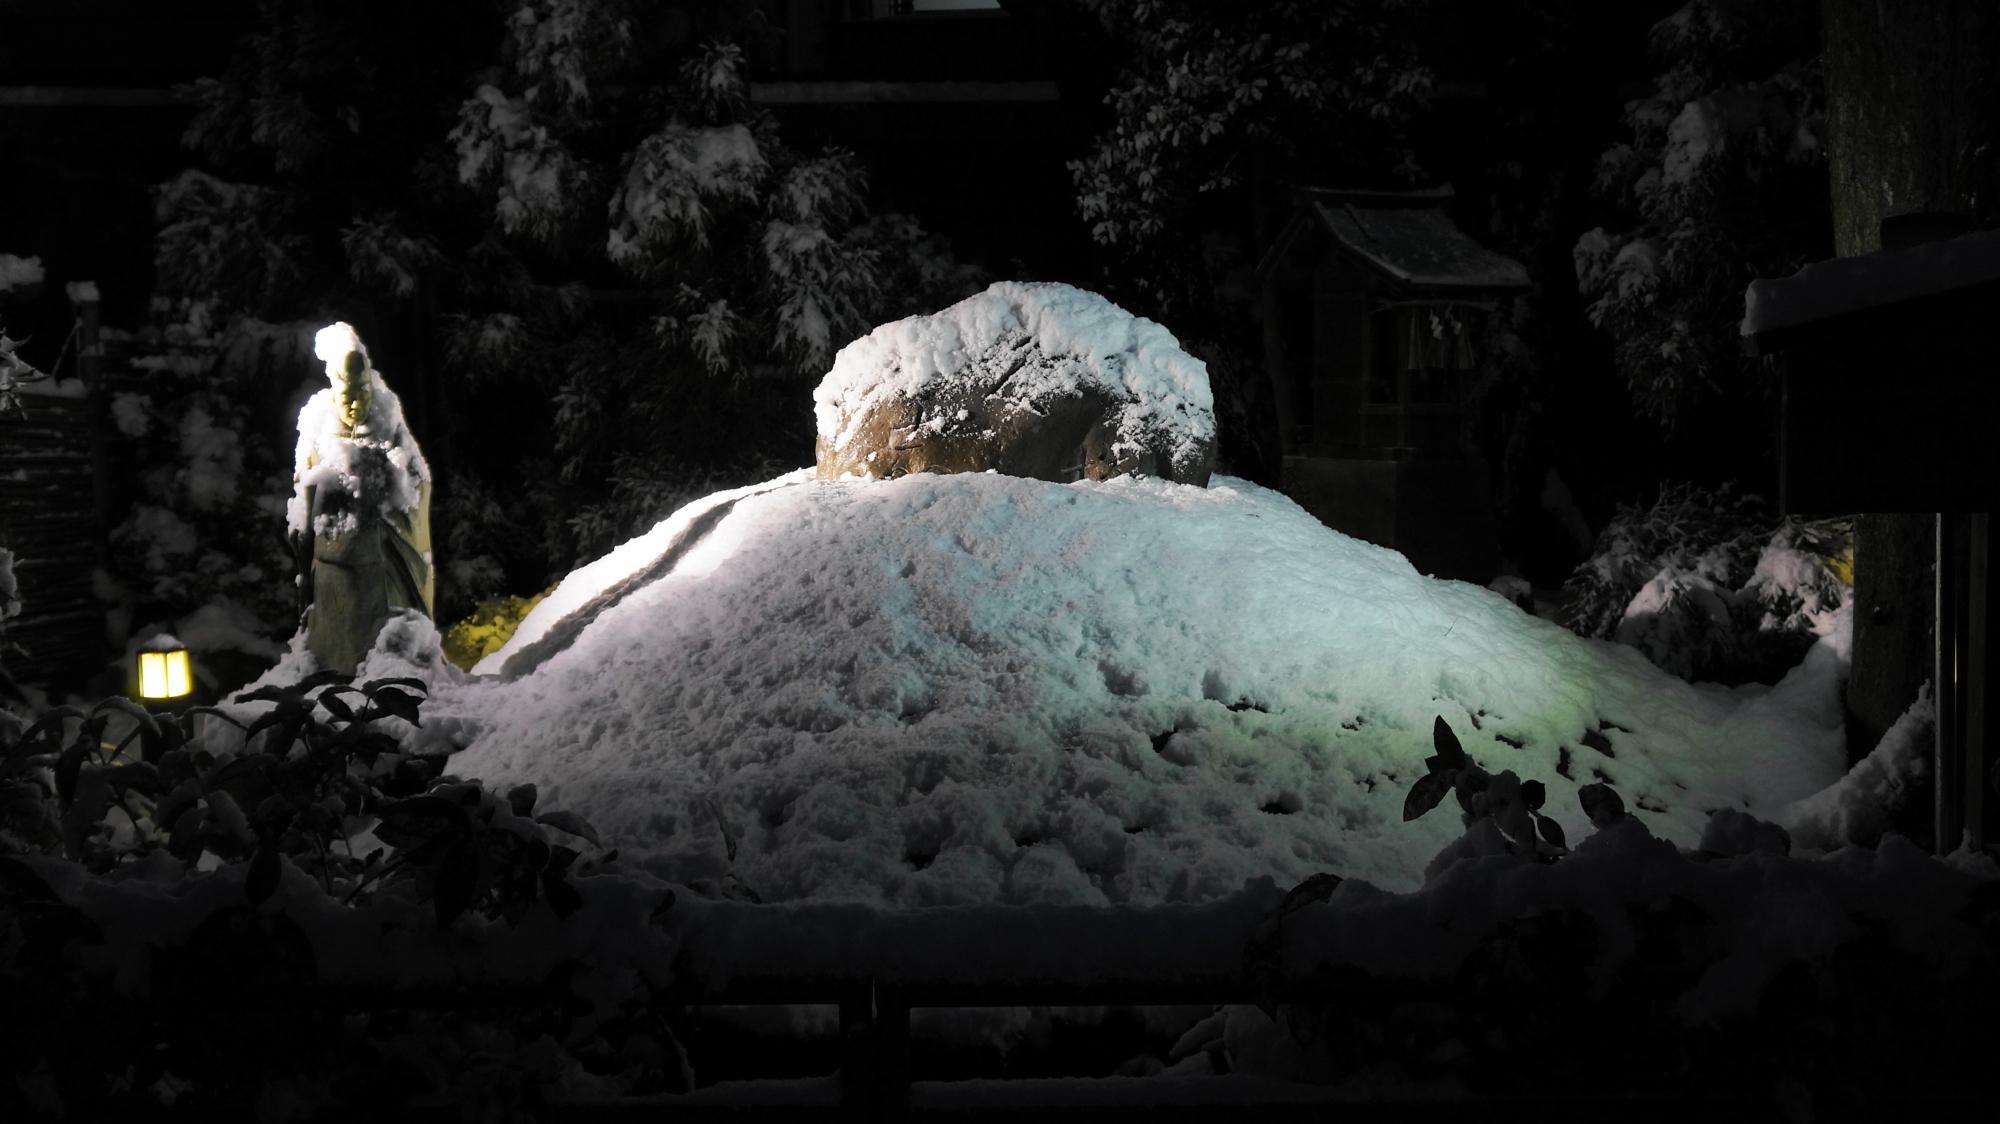 安井金比羅宮の久志塚(櫛塚)の雪景色